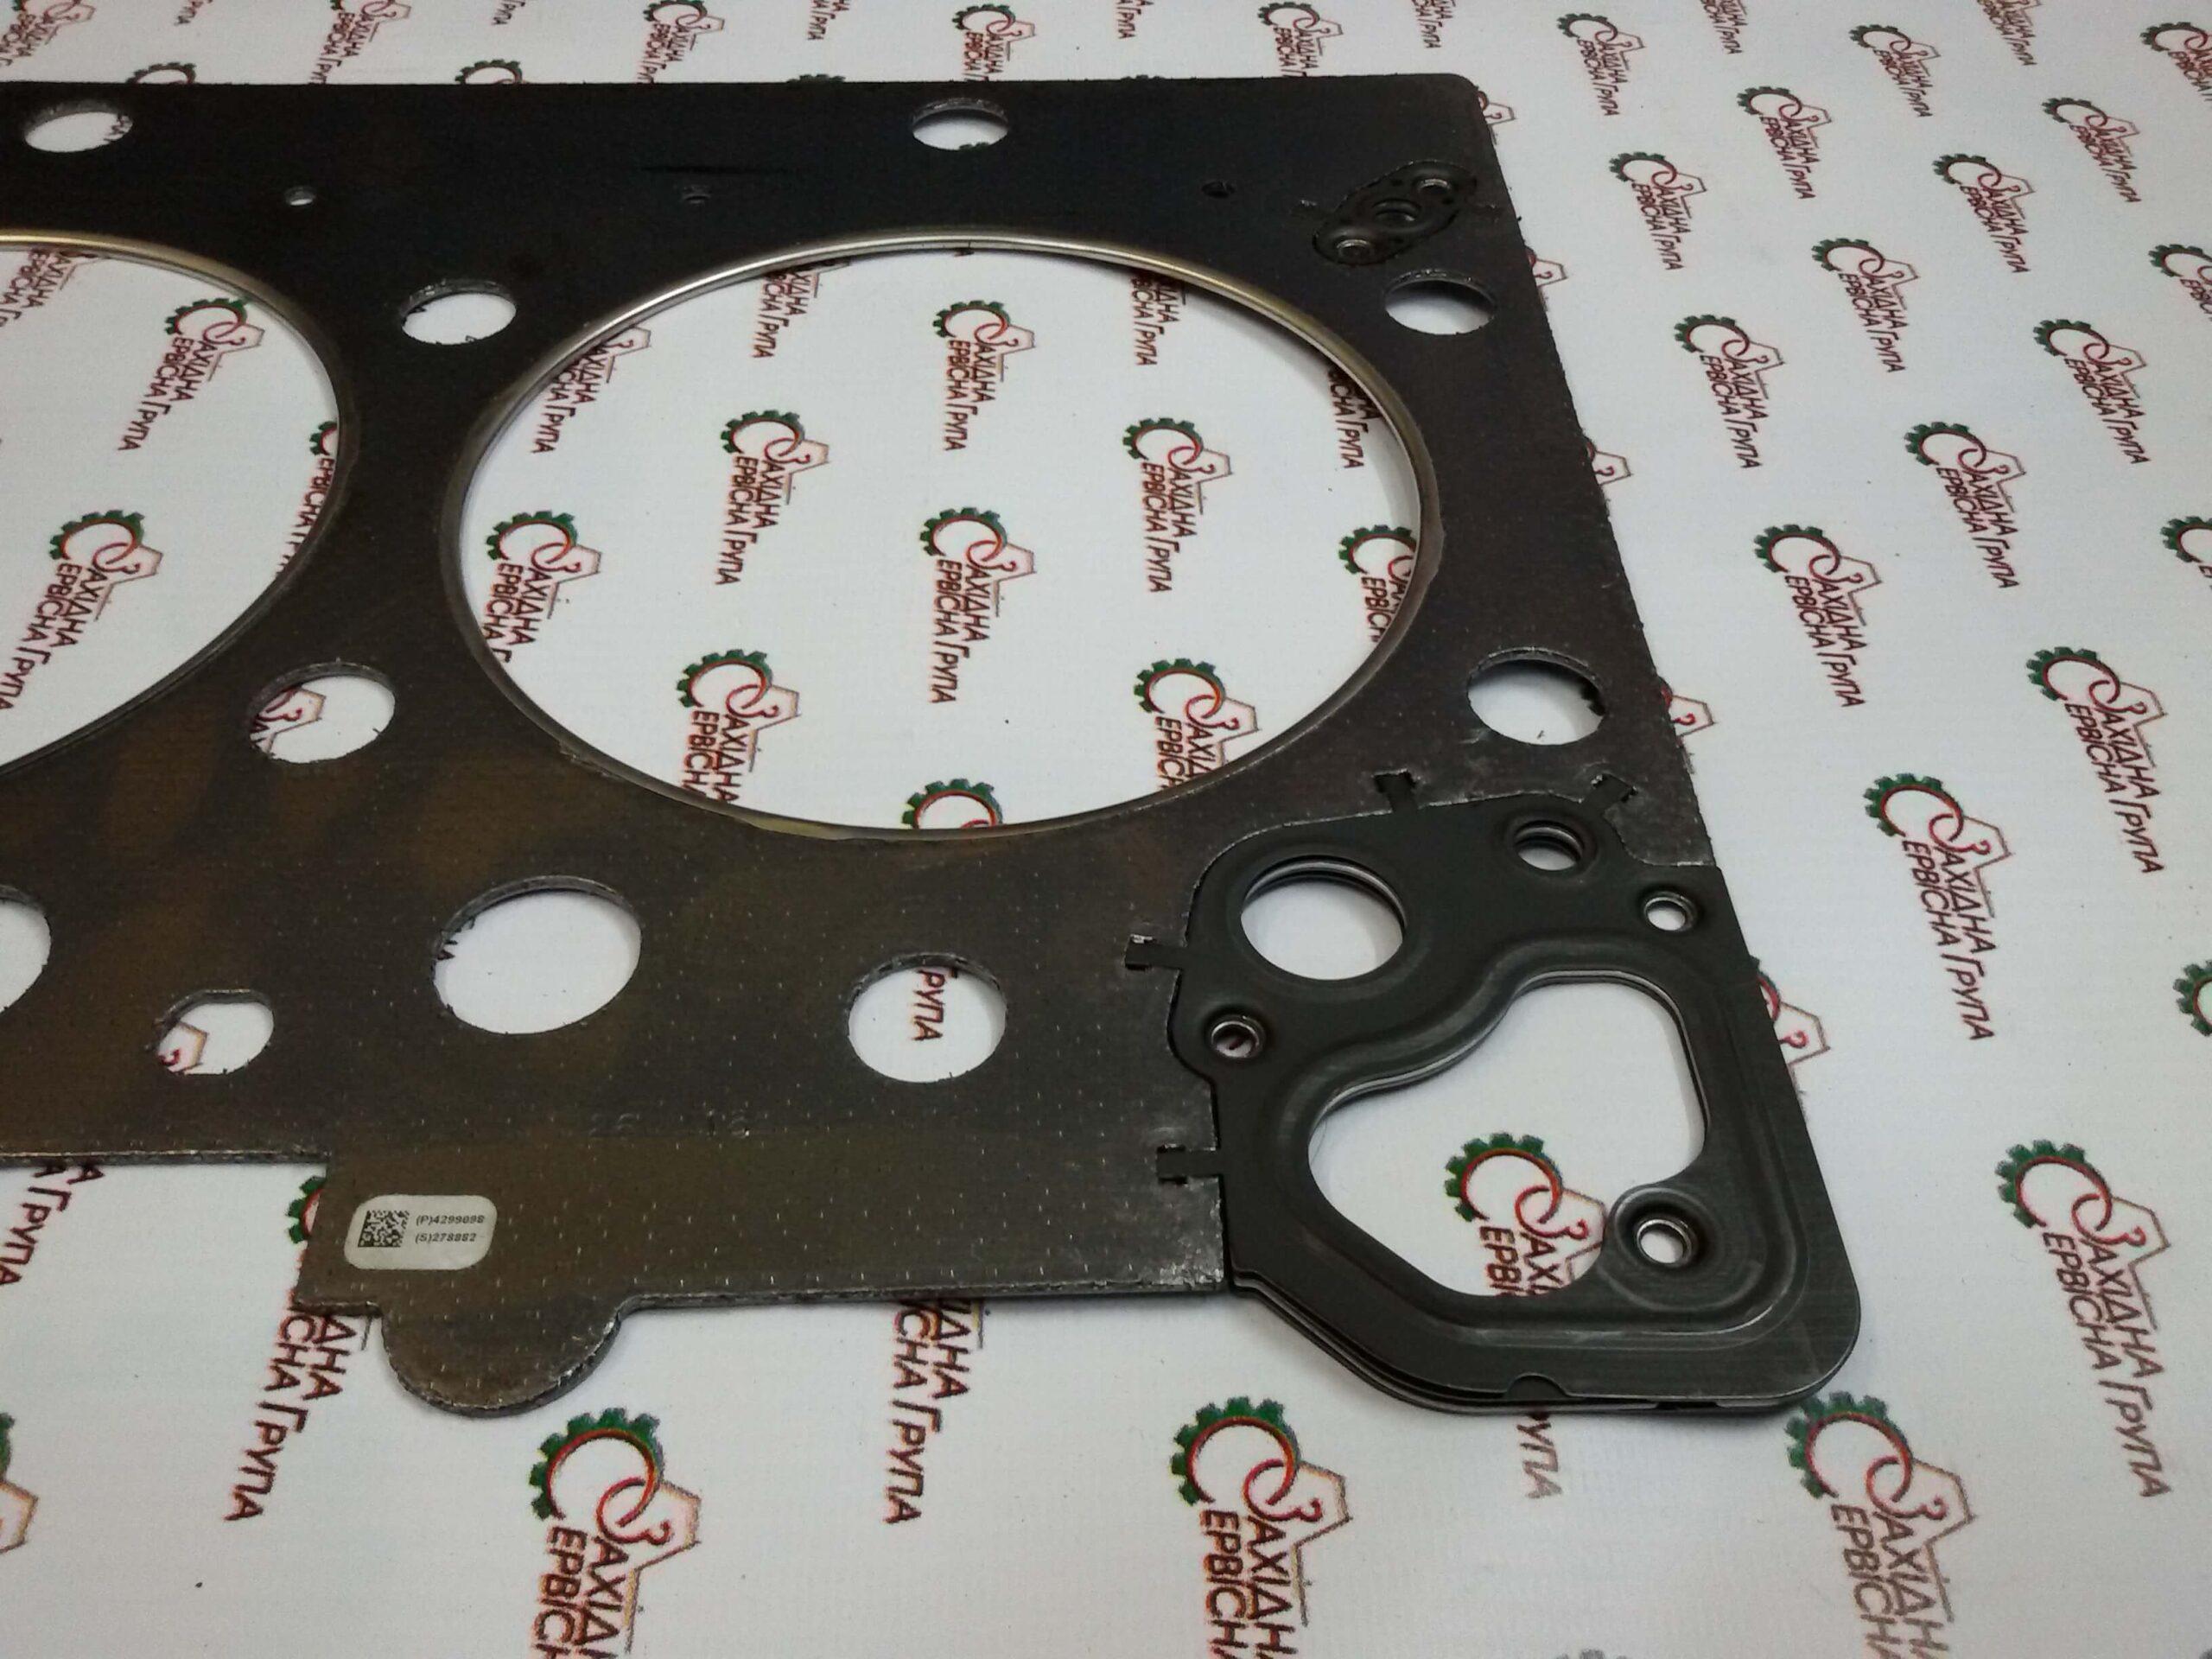 Прокладка головки блока цилиндров двигателя Cummins ISX15, QSX15, 4299098, 4926316, 3685834, 4059350.